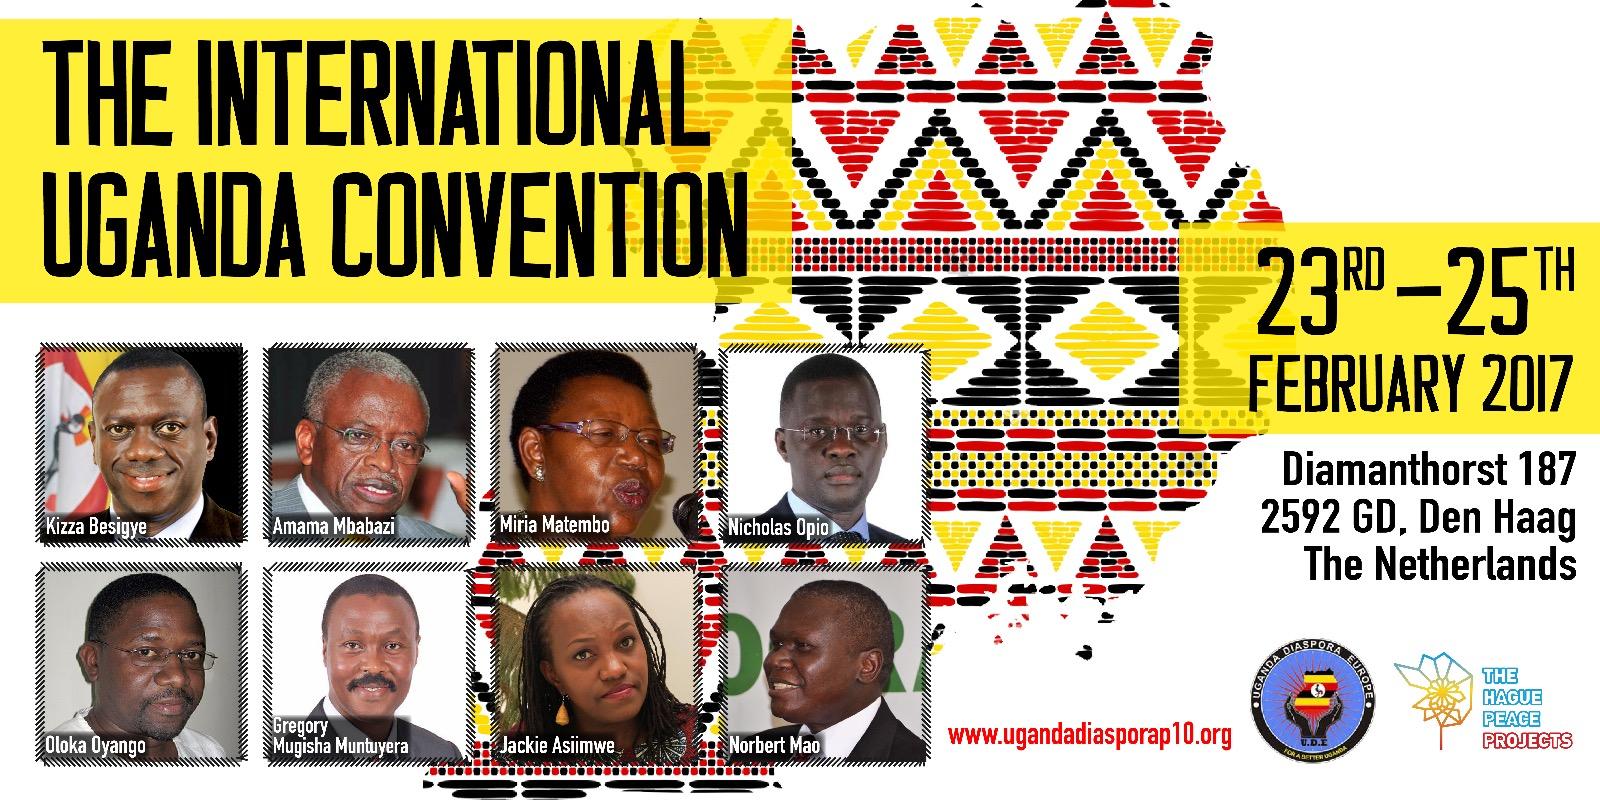 https://www.ugandadiasporap10.org/